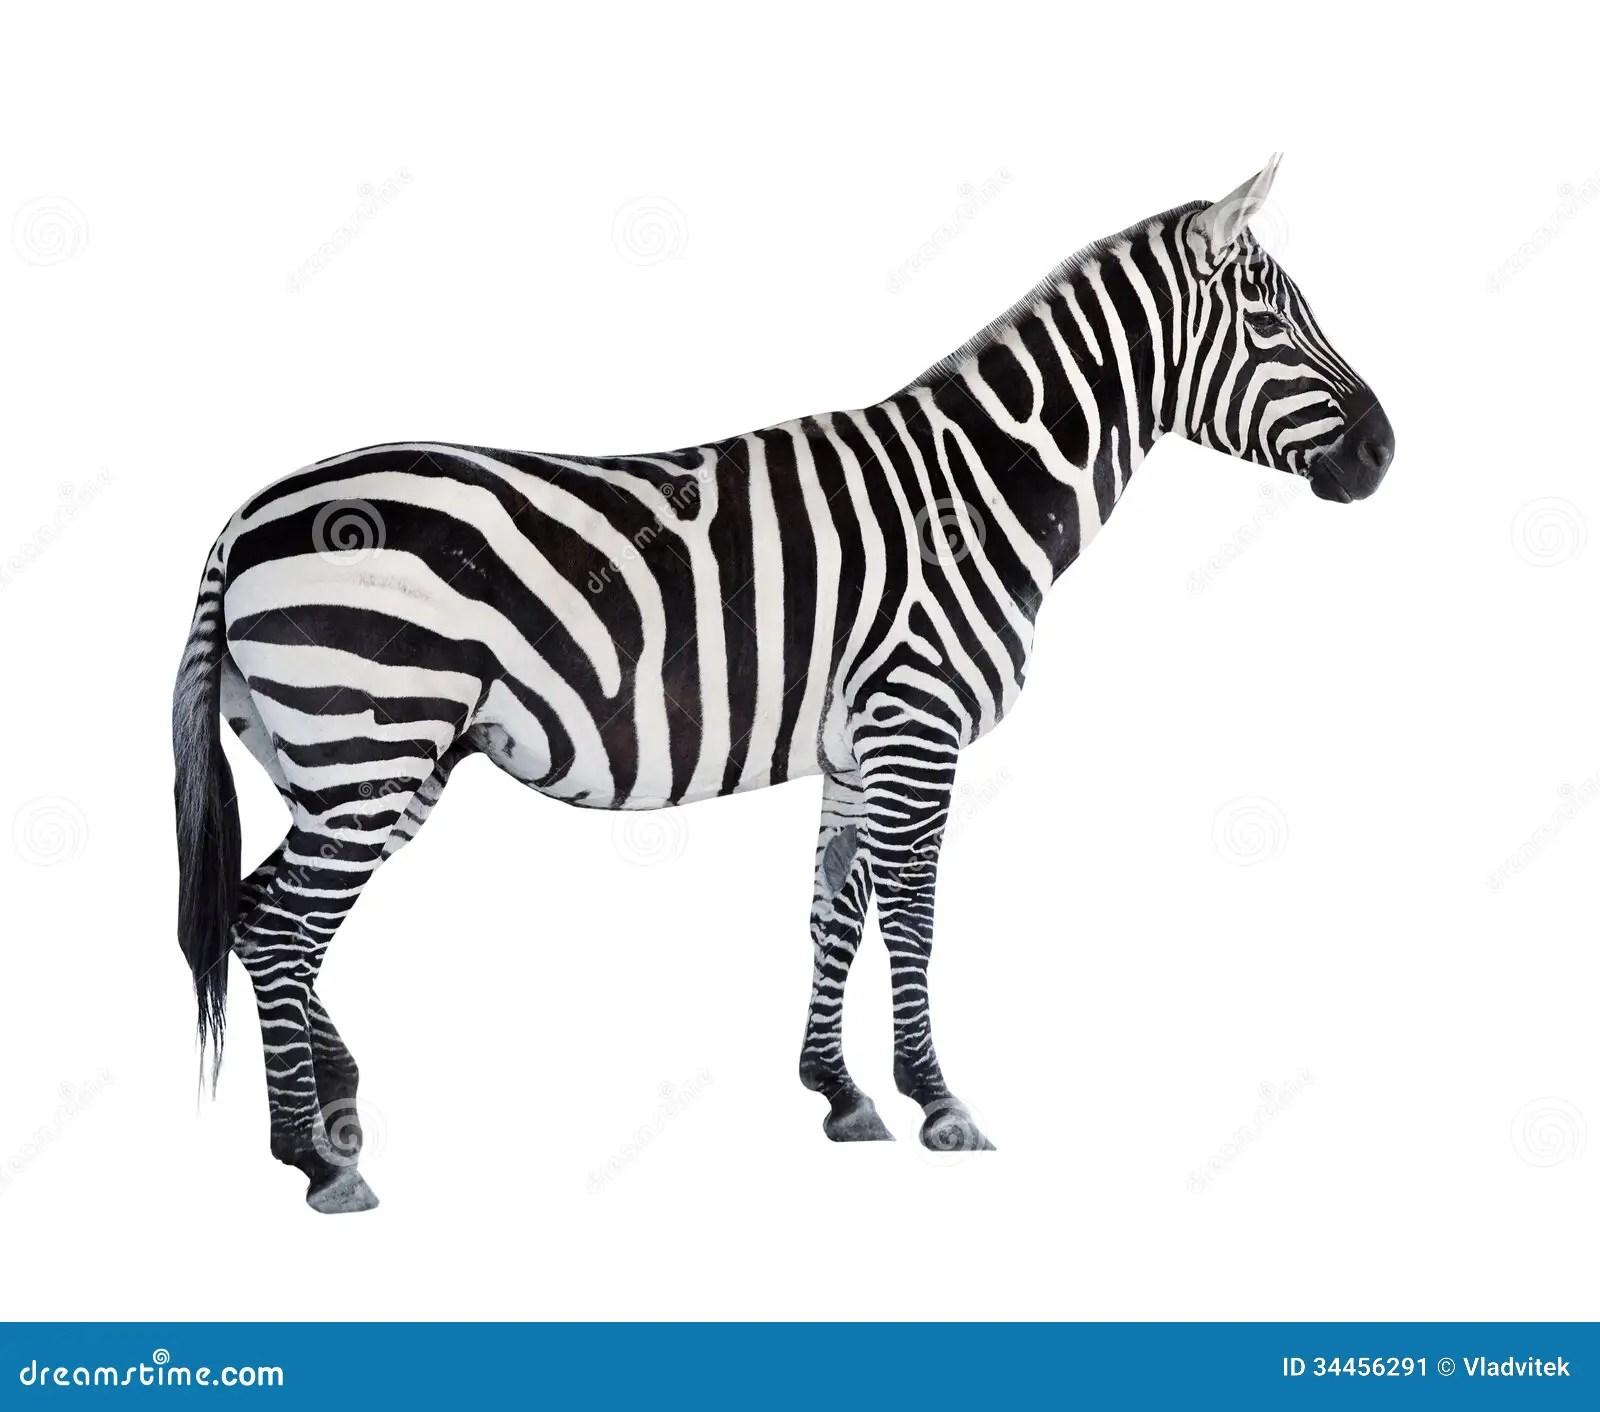 The Zebra Stock Image